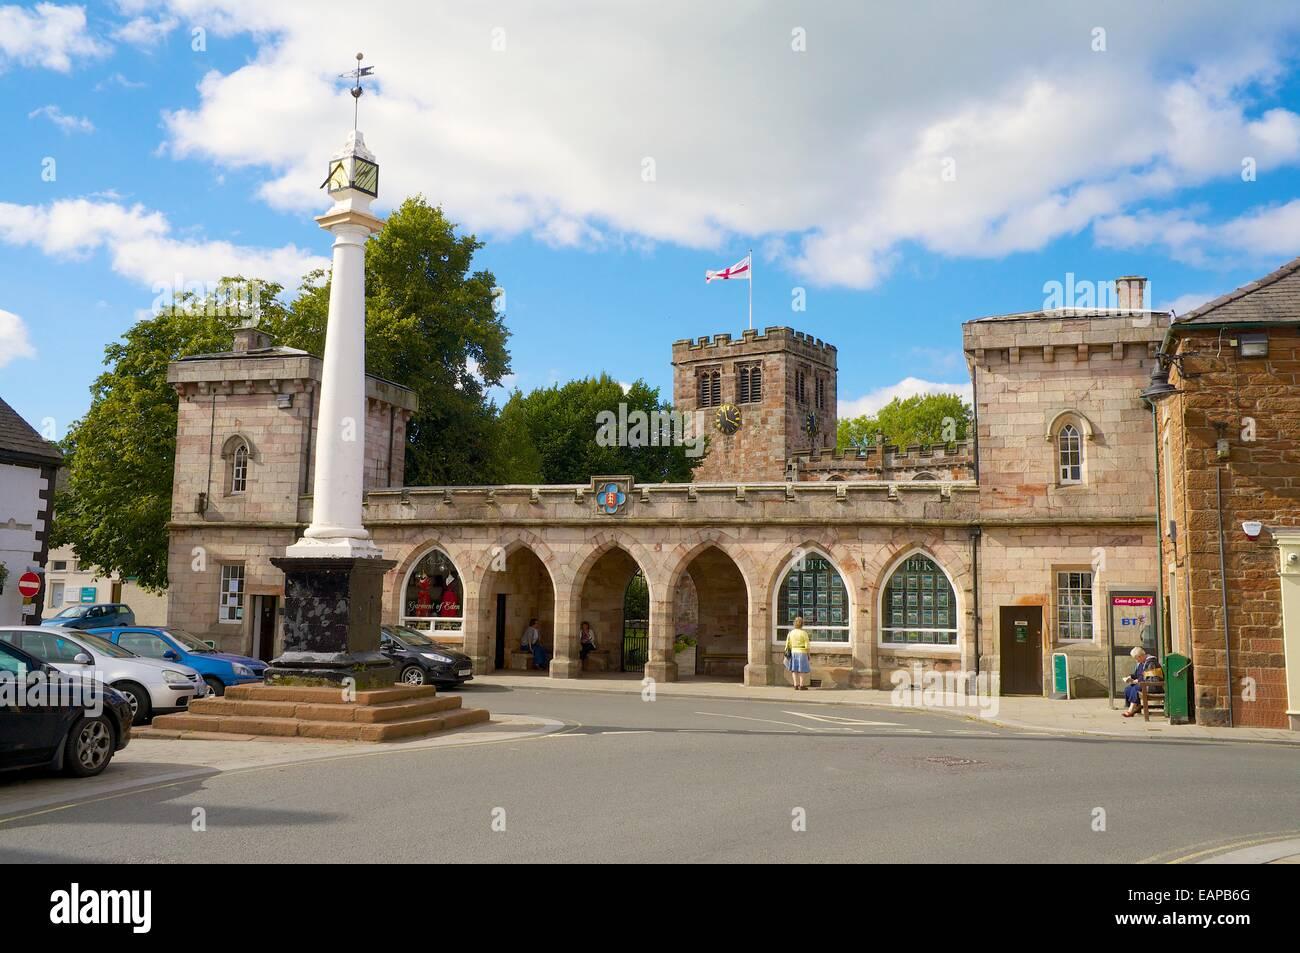 The High Cross Boroughgate. Appleby-in-Westmorland, Cumbria, England, United Kingdom. - Stock Image